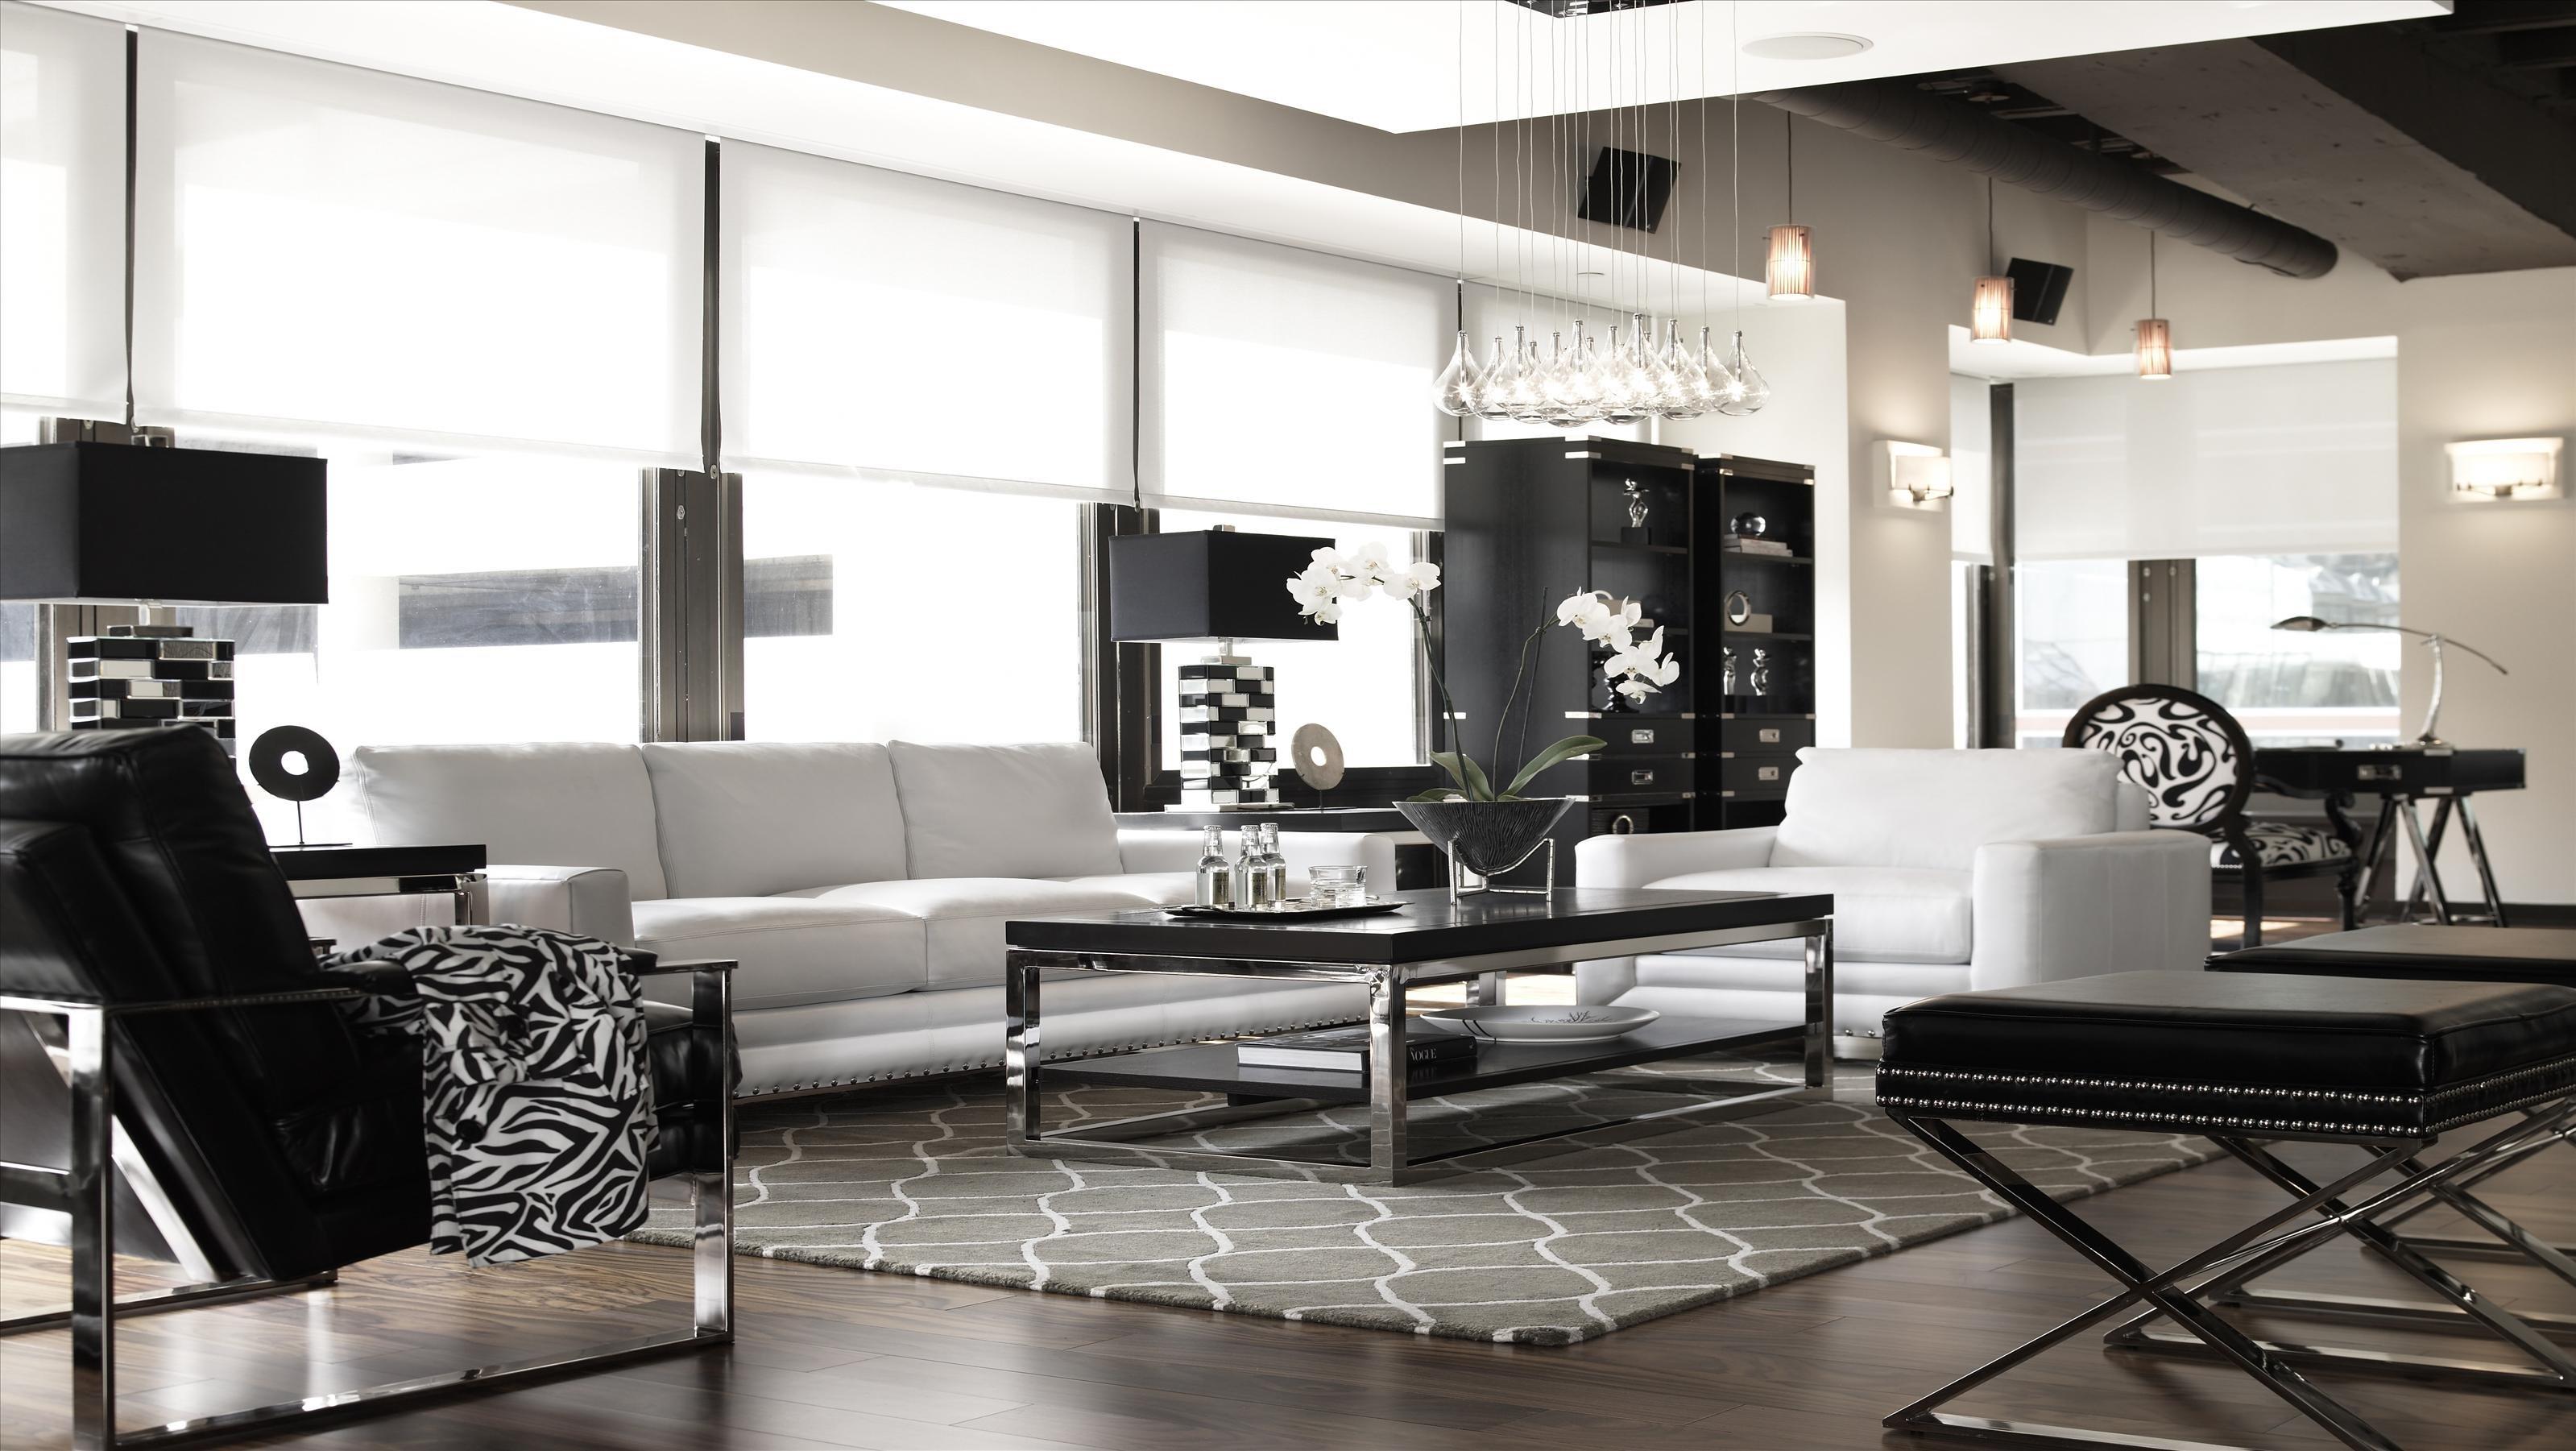 Interior Design Room House Home Apartment Condo 246 Wallpaper 3198x1801 317424 Wallpaperup